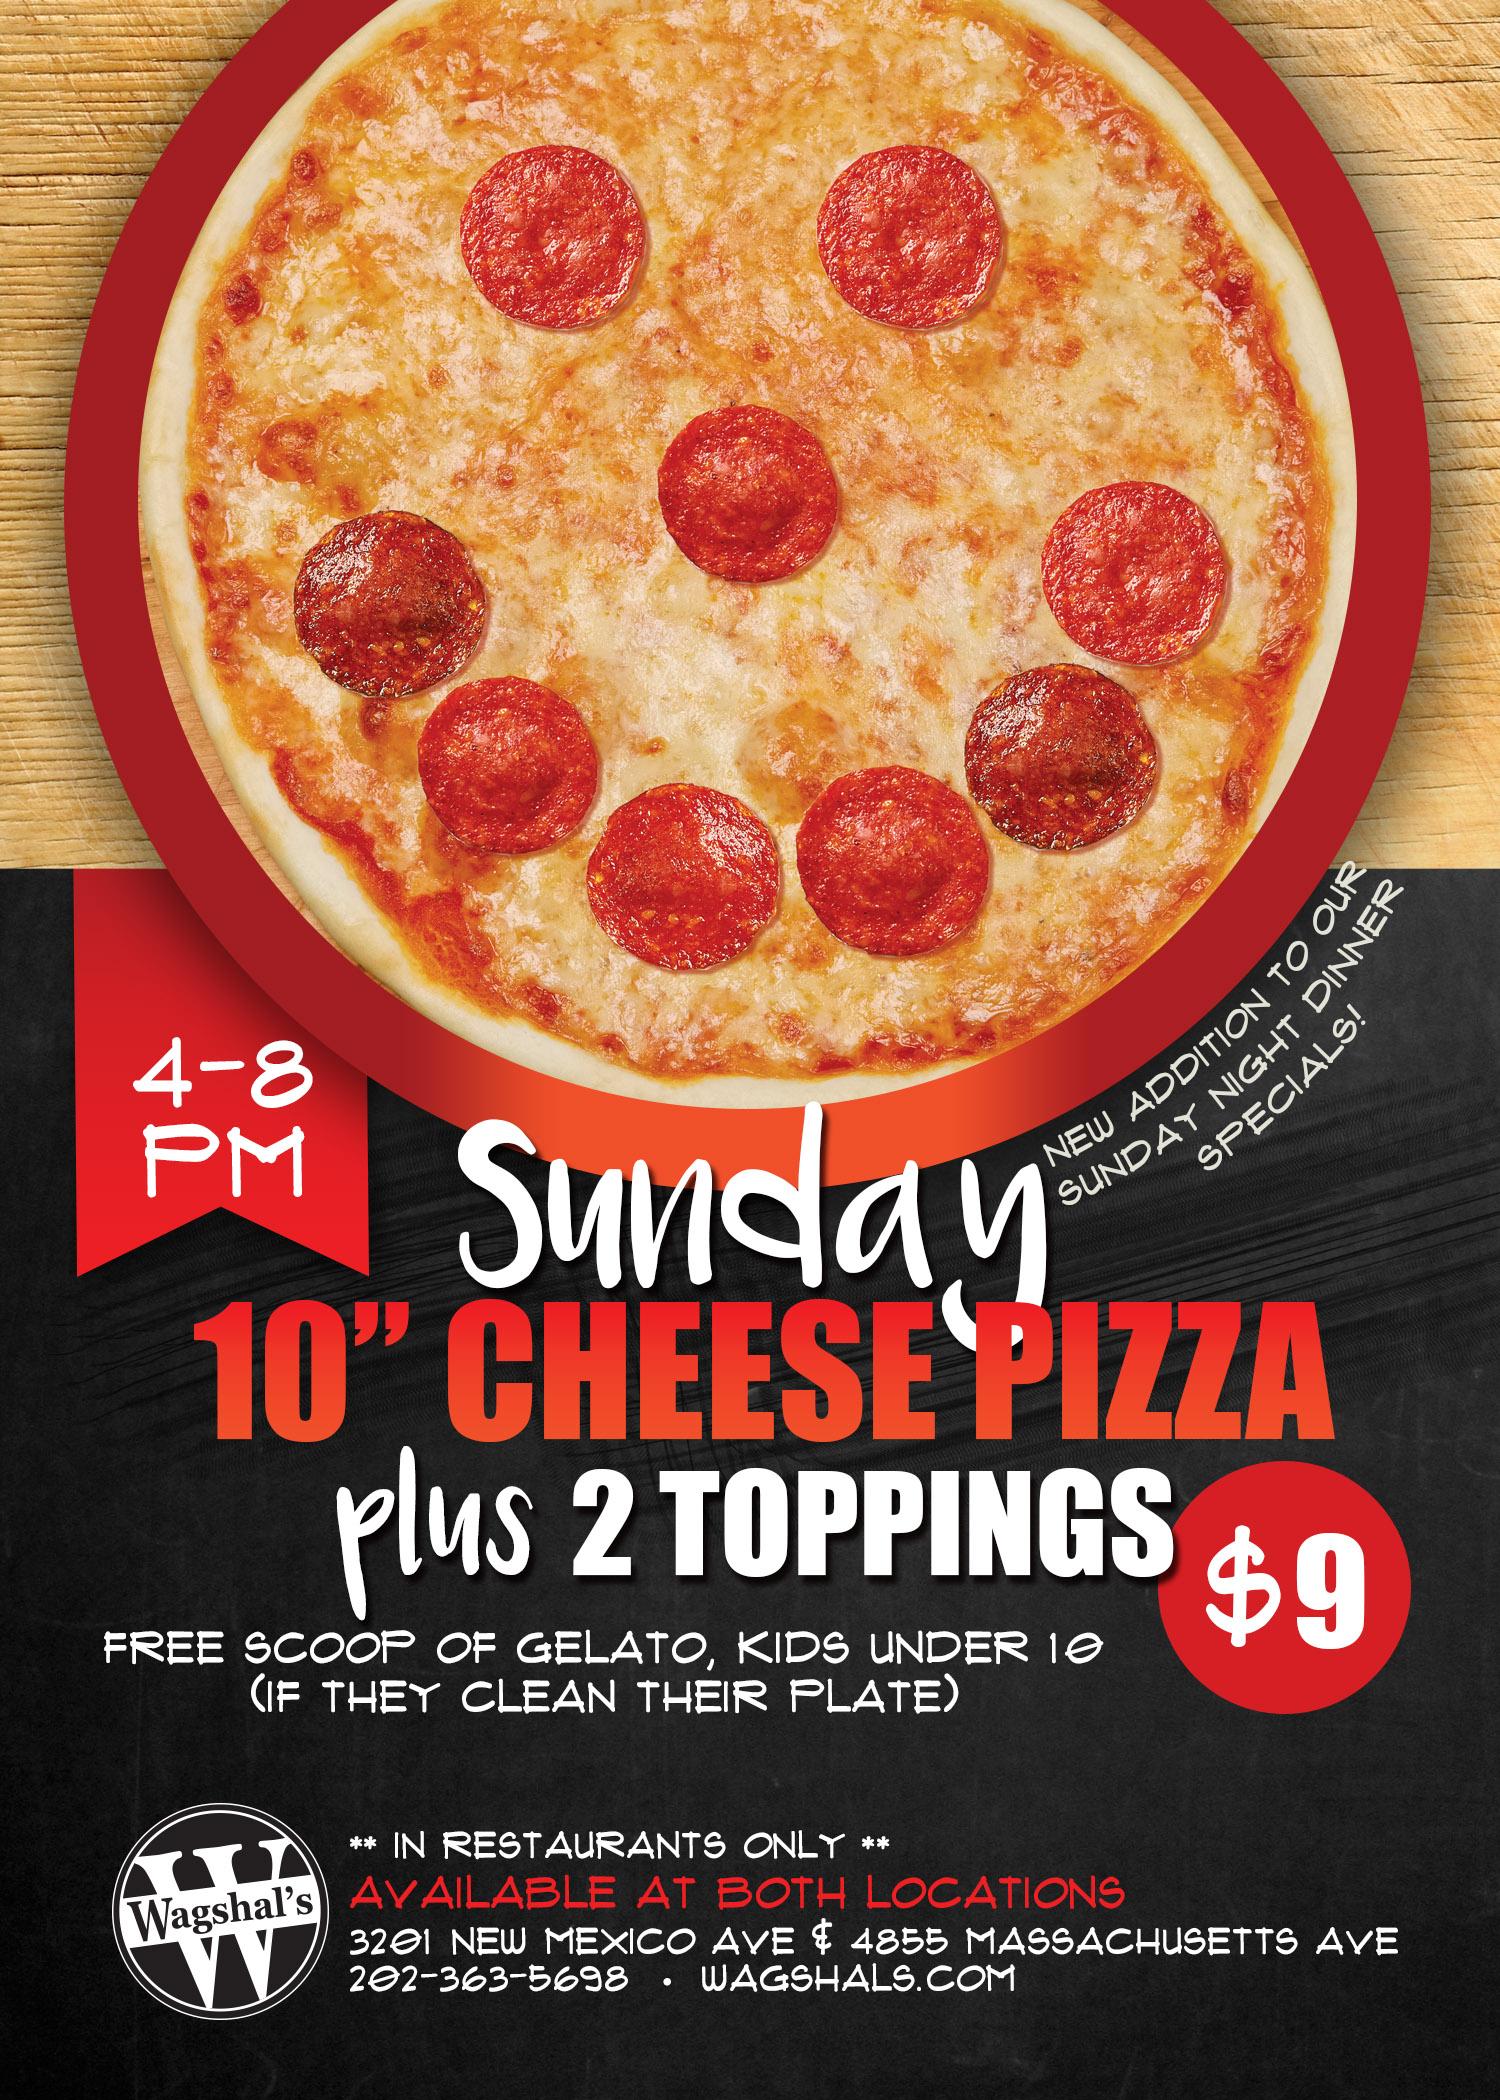 018-08-20B+SUNDAY+PIZZA+E-BLAST.jpg